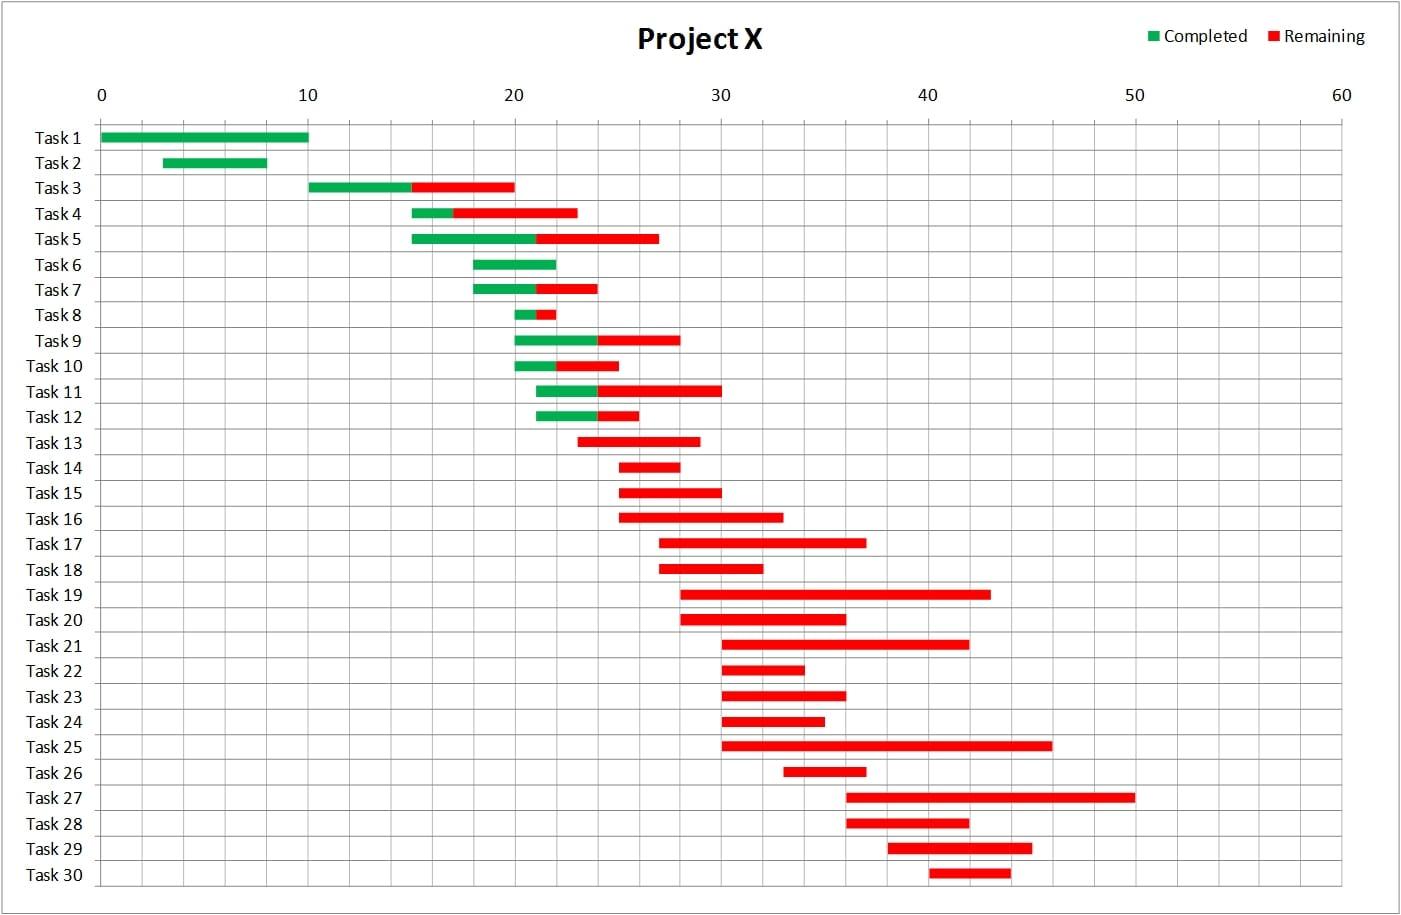 Project Management Gantt Chart Excel Excel Spreadsheet Gantt Chart Template Spreadsheet Templates for Busines Spreadsheet Templates for Busines Gantt Chart Excel Templates 2010